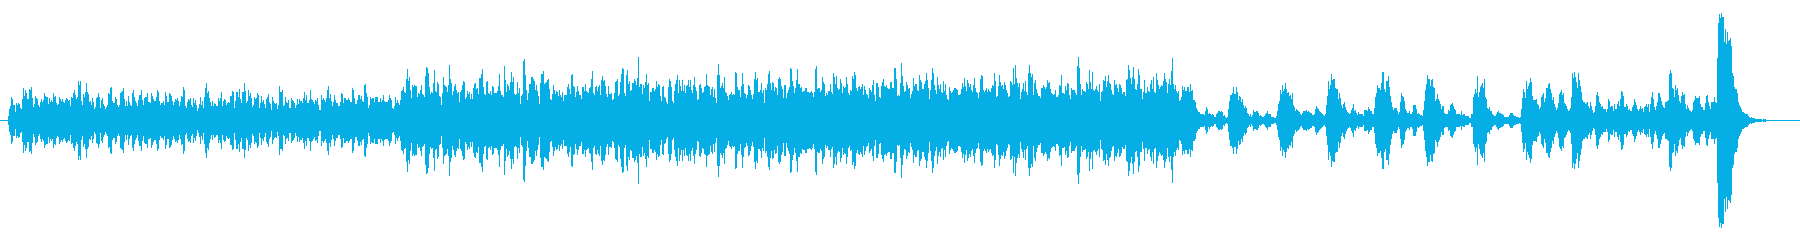 c悲劇的で緊迫したストリングス 1分の再生済みの波形